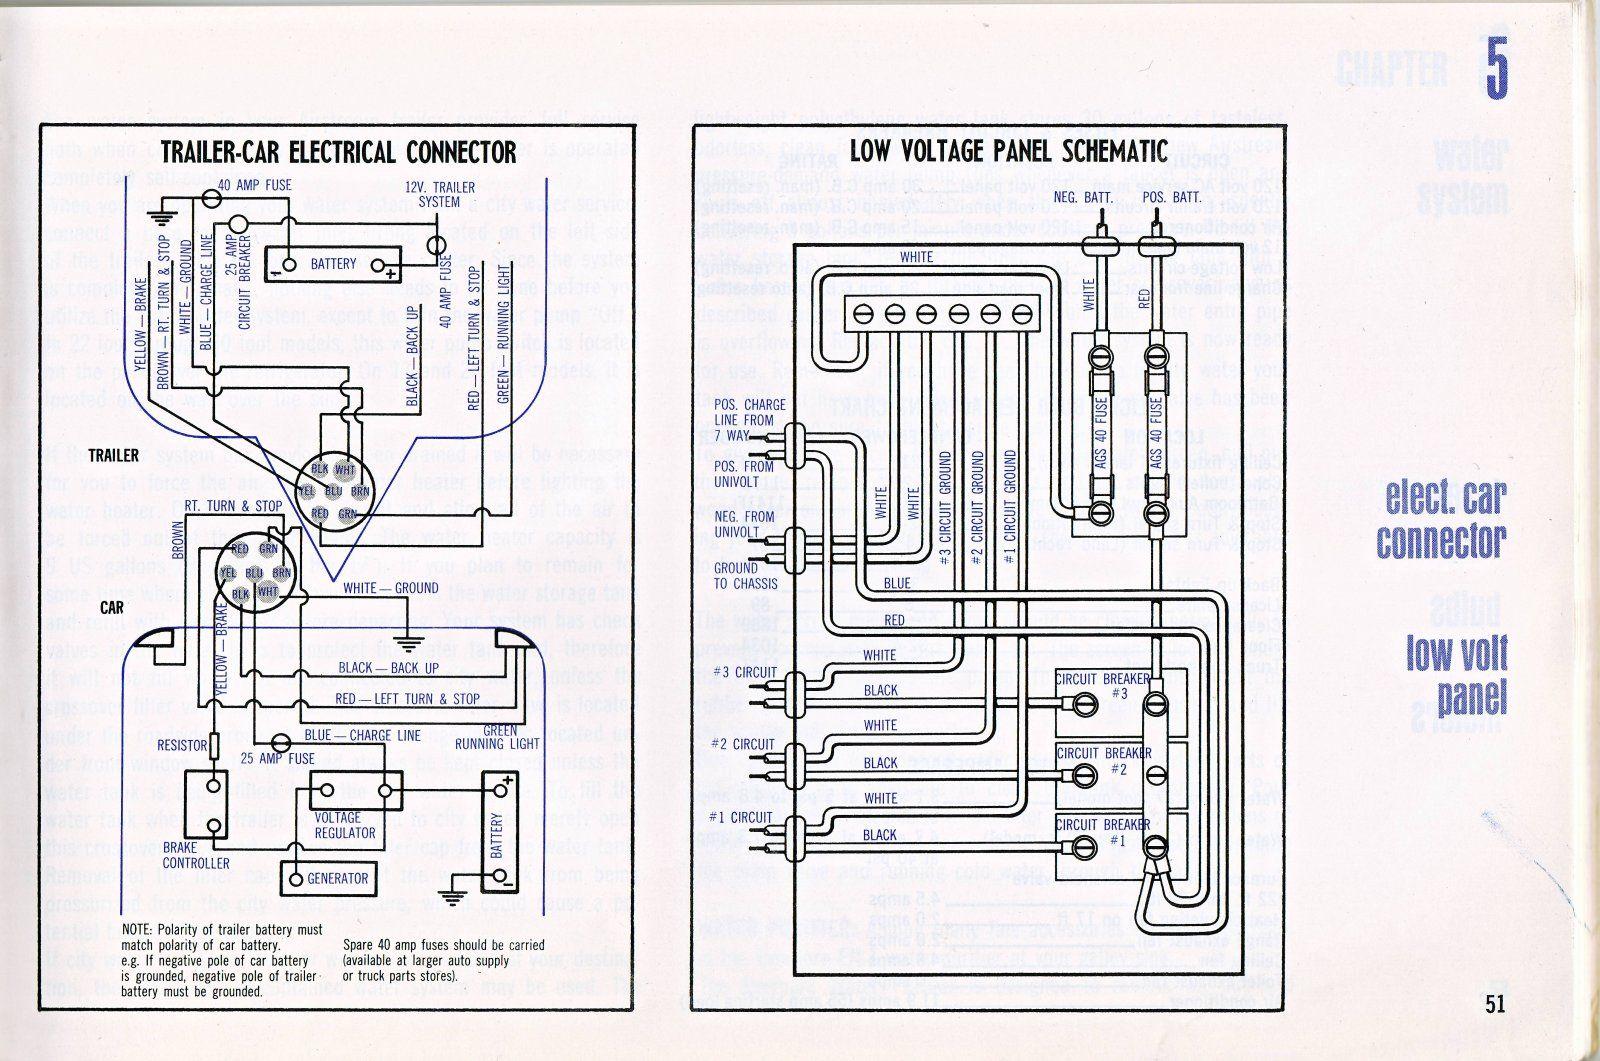 Airstream Wiring Diagrams 1998 Cadillac Seville Wiring Diagram Wire Diag Yenpancane Jeanjaures37 Fr